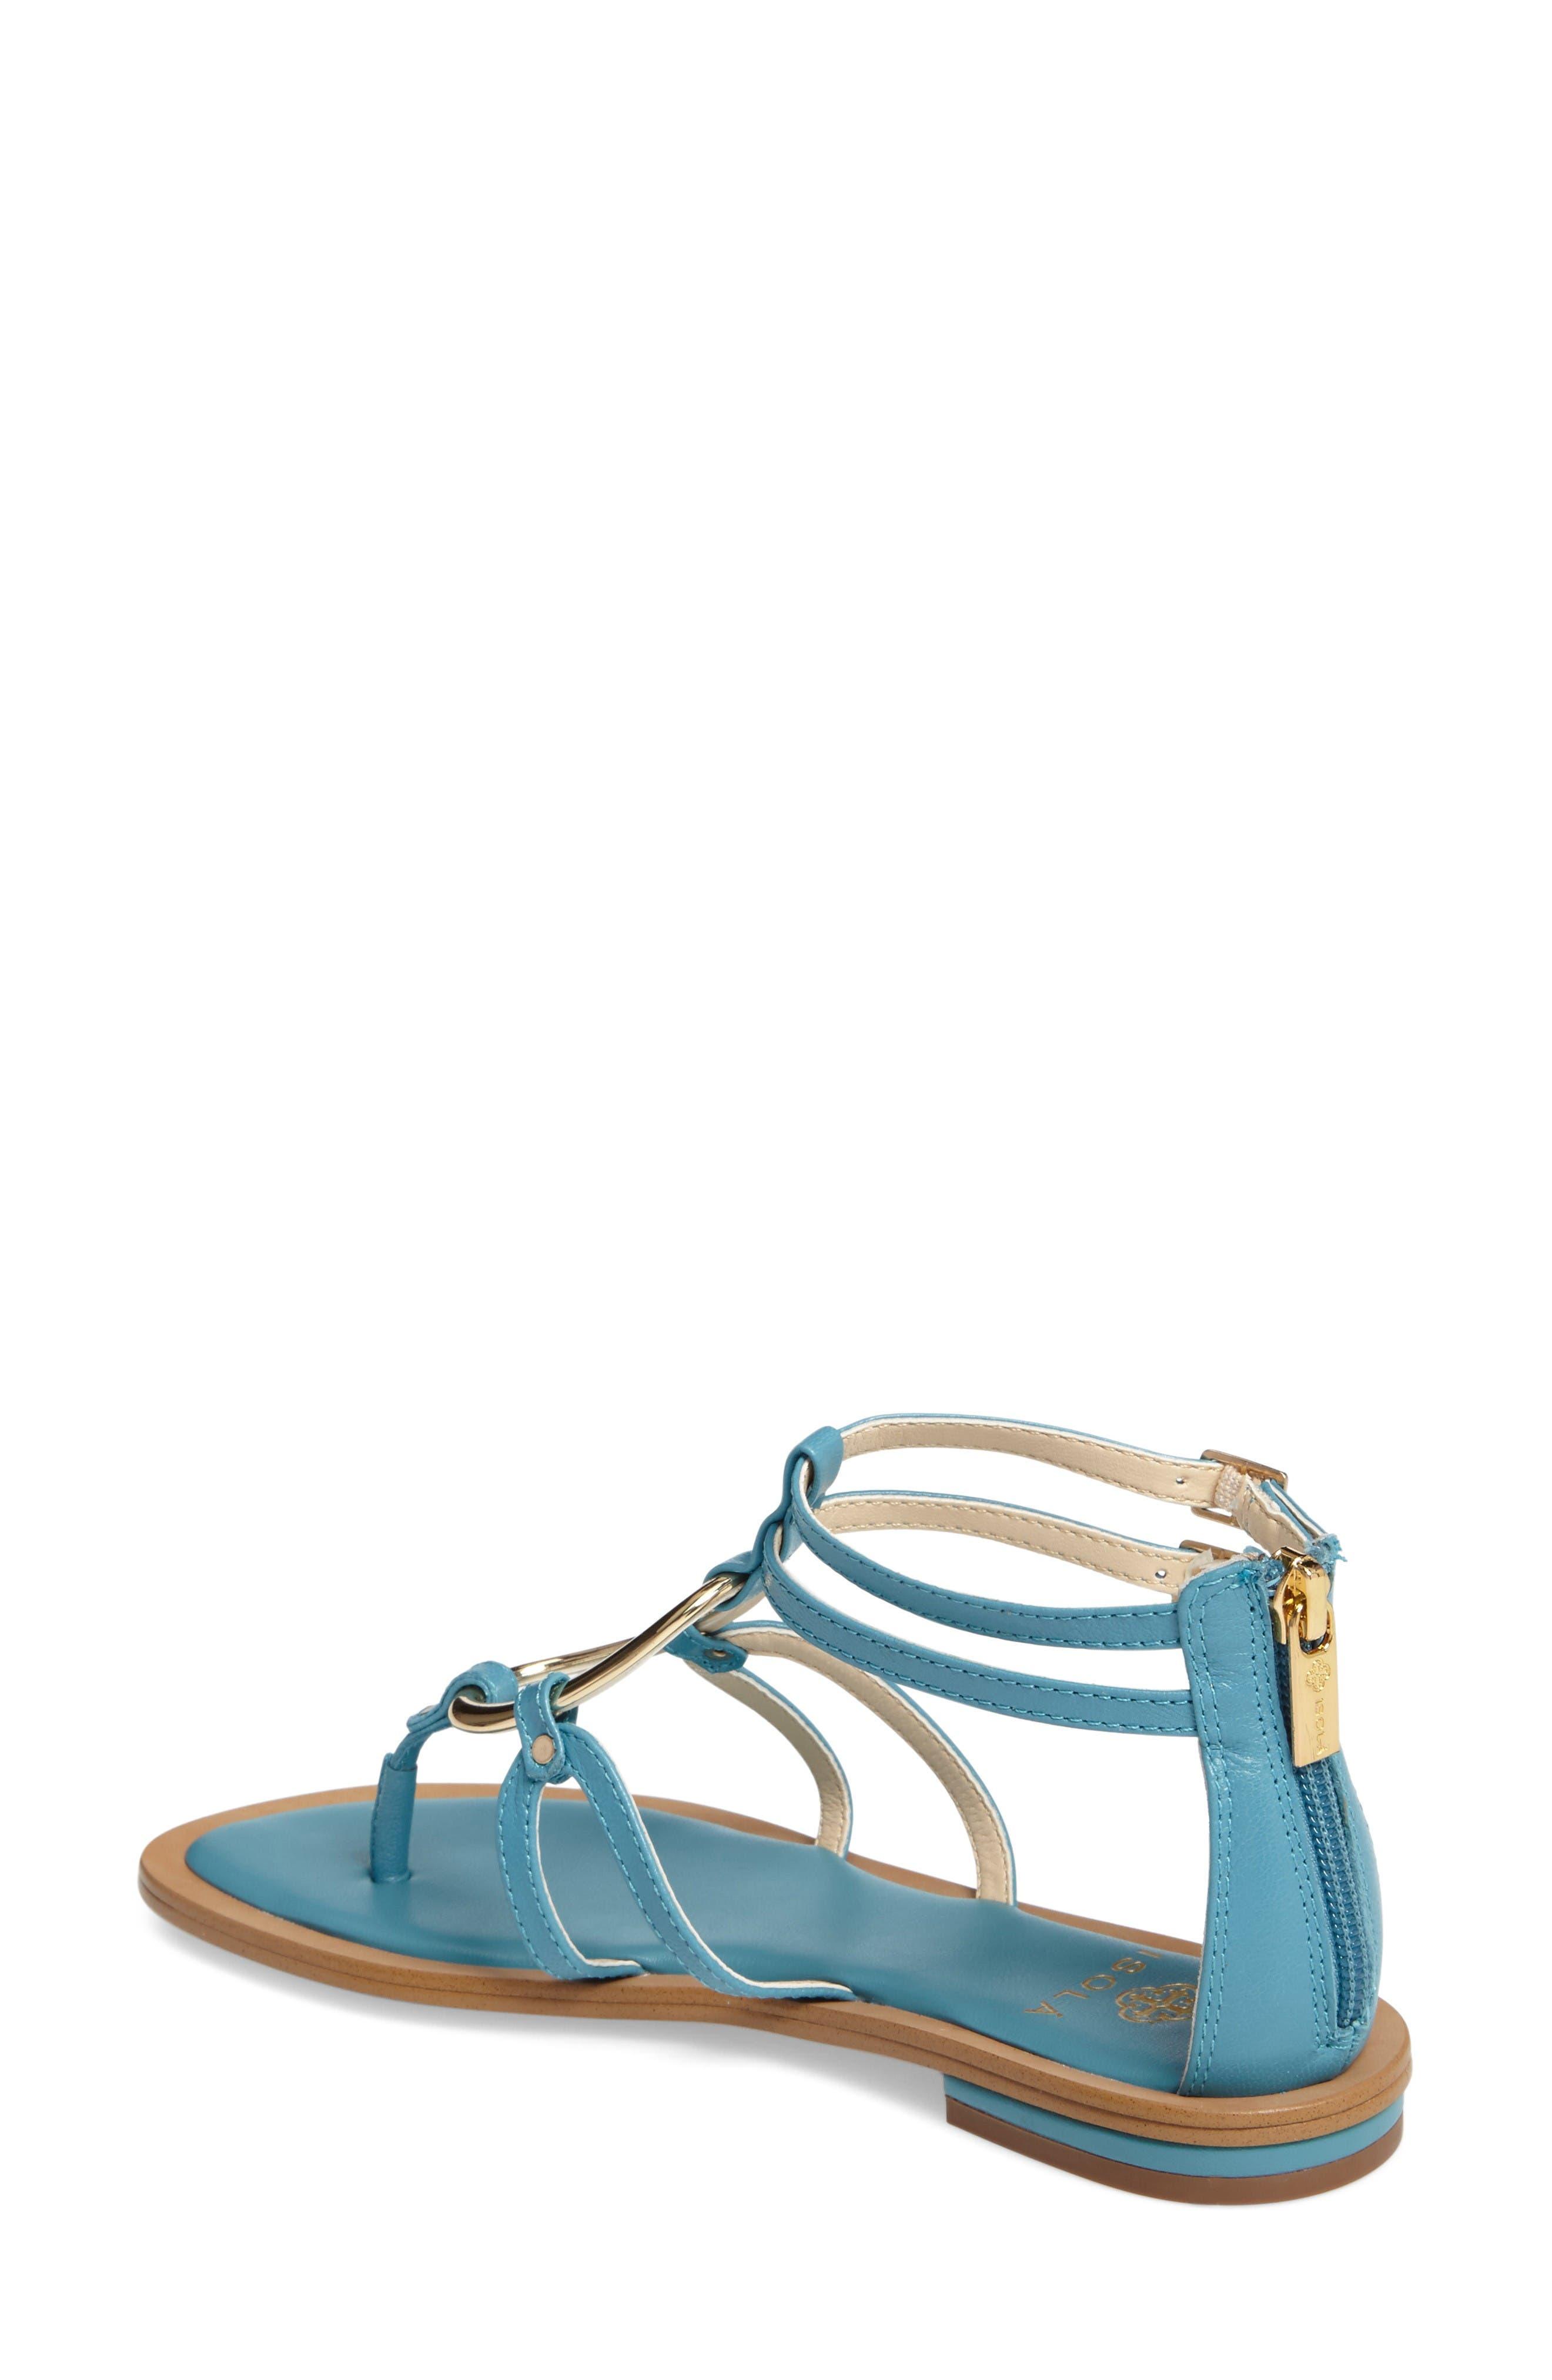 Melaney Sandal,                             Alternate thumbnail 2, color,                             Aqua Leather